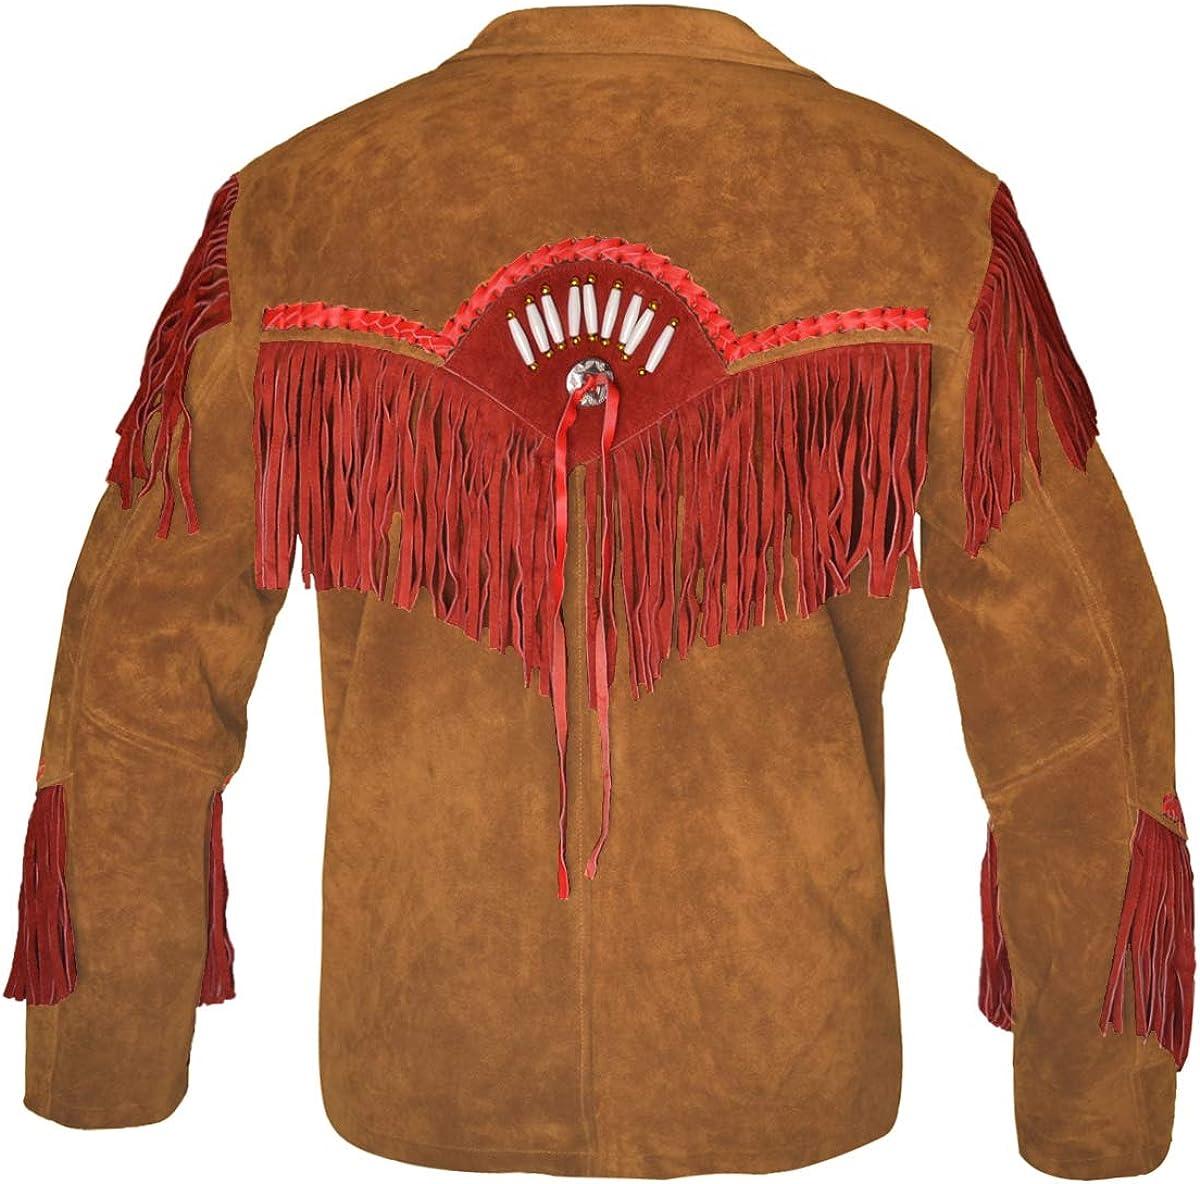 MSHC Western Cowboy Mens Brown Fringed Suede Leather Jacket D1 XXS-5XL Brown RED Blue Black